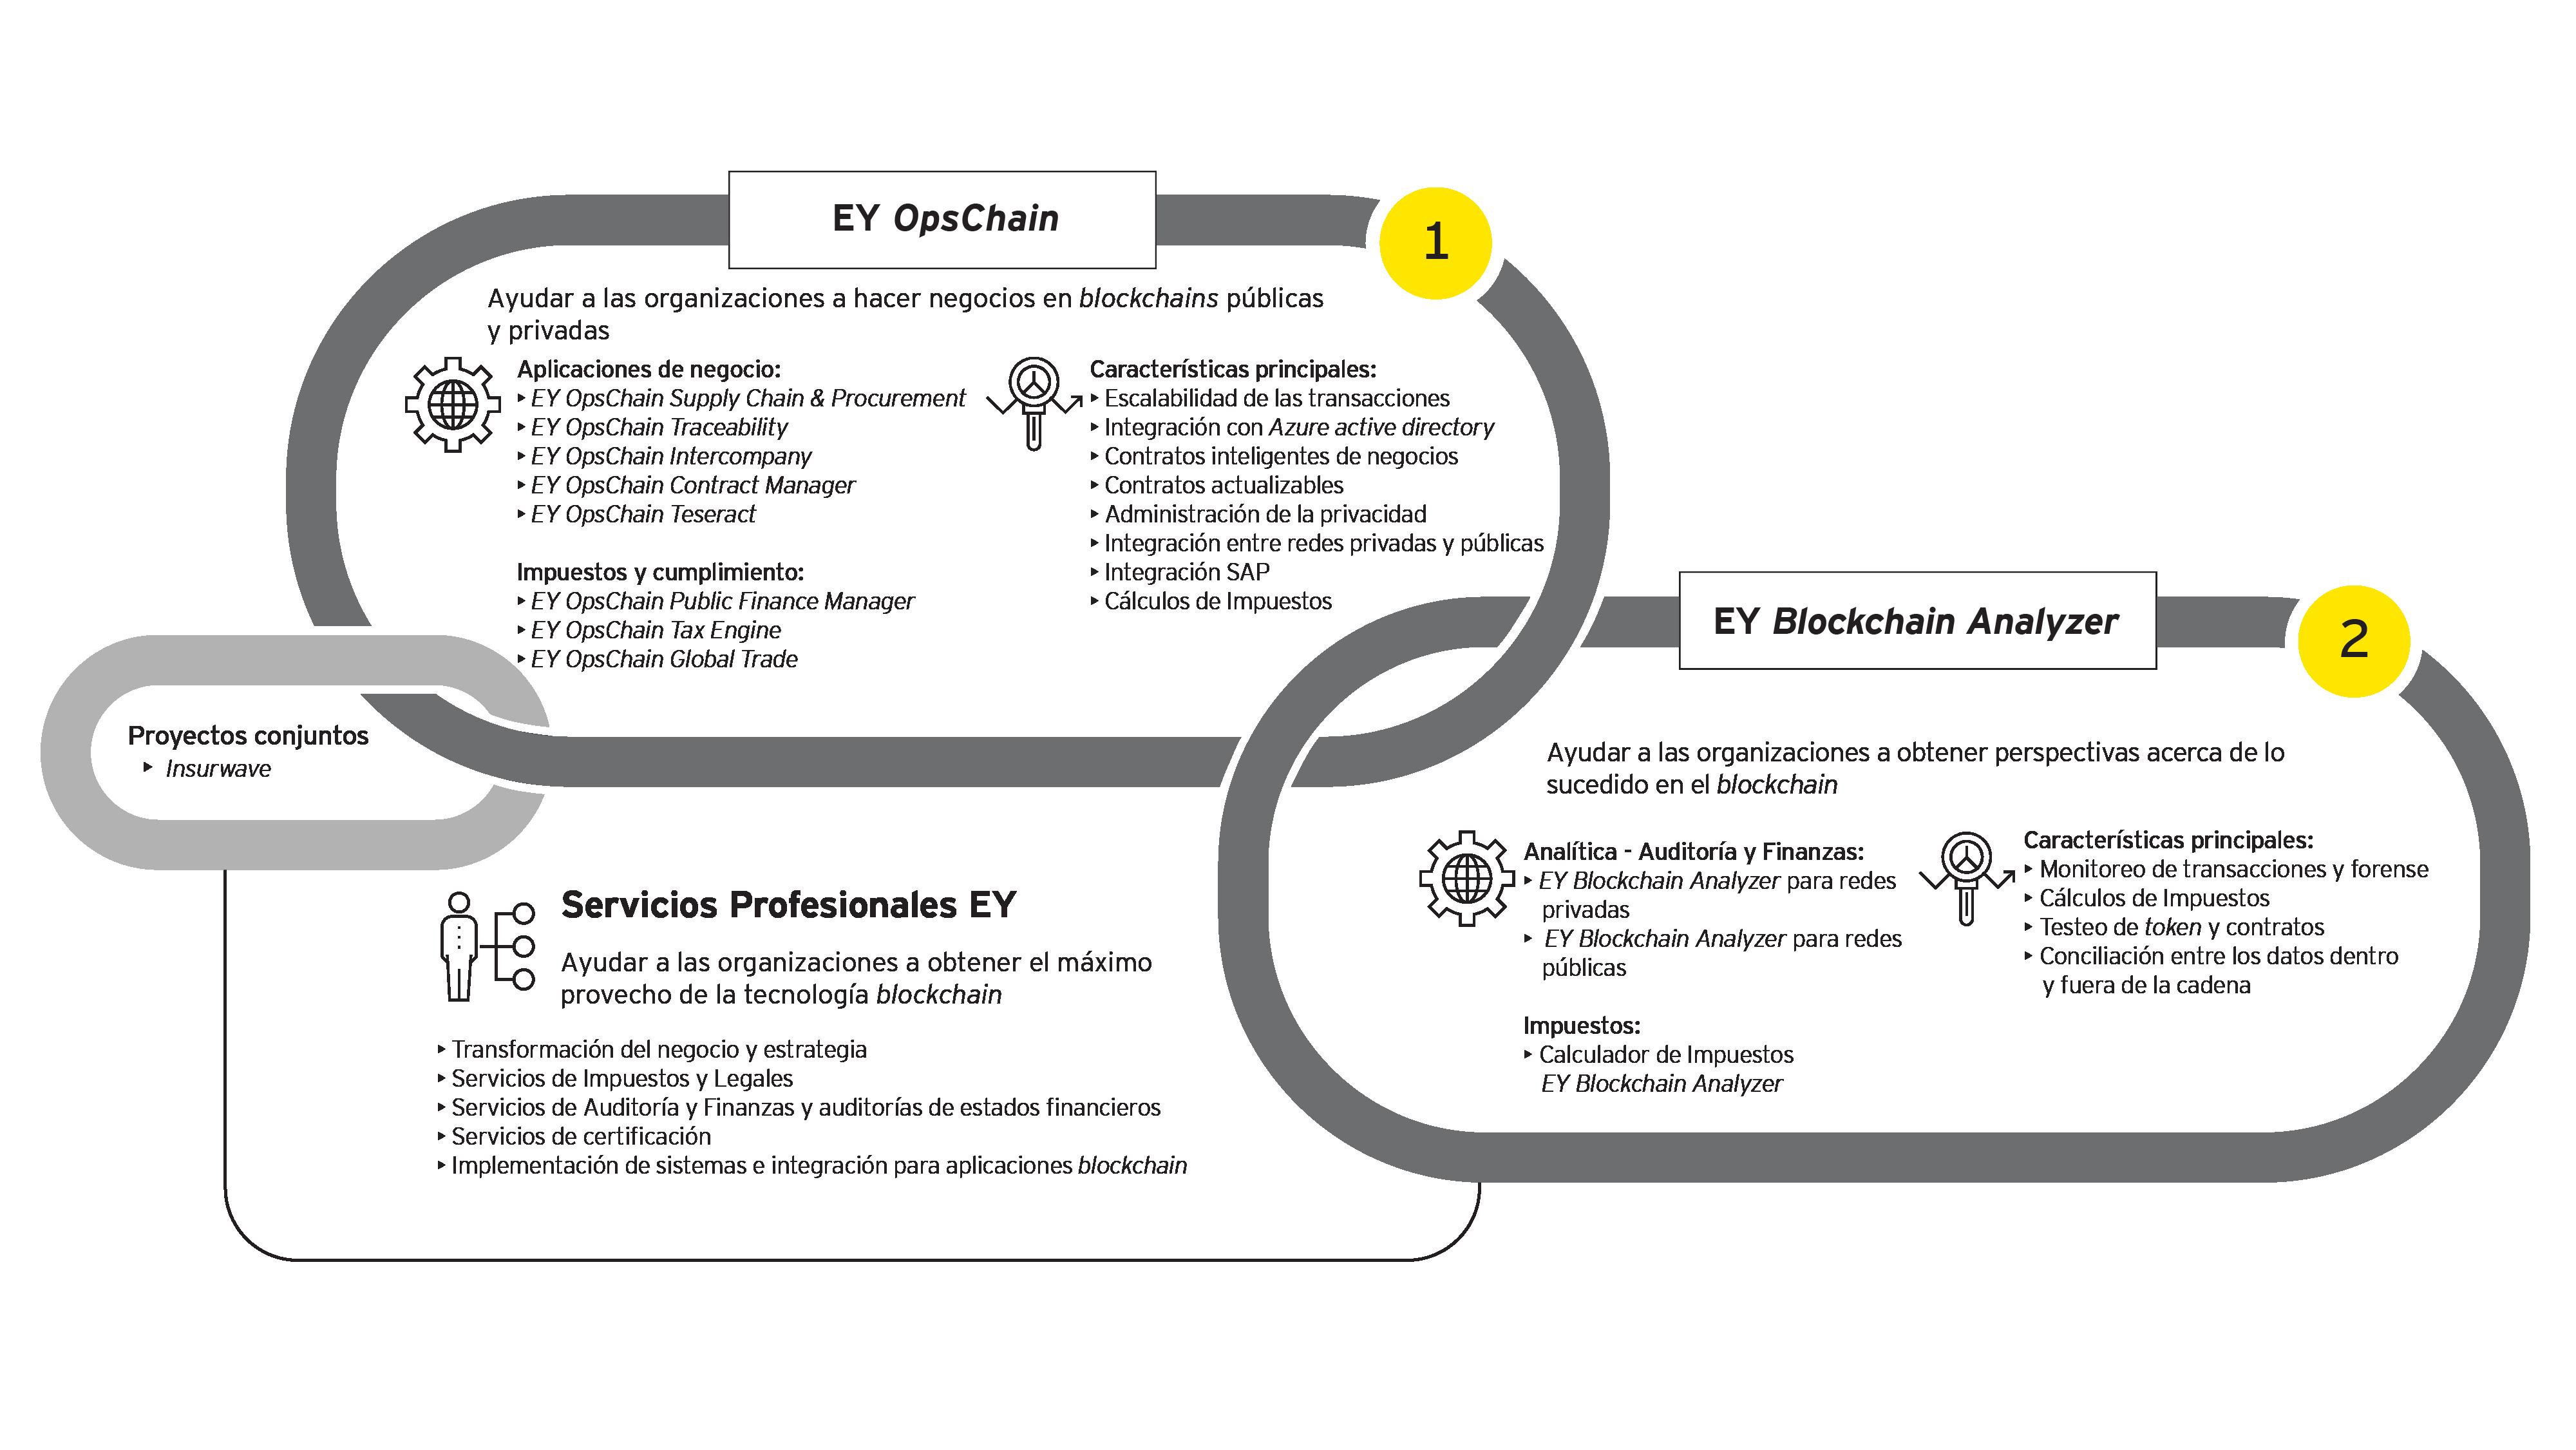 Infografía que muestra las plataformas de <em>blockchain</em> de EY